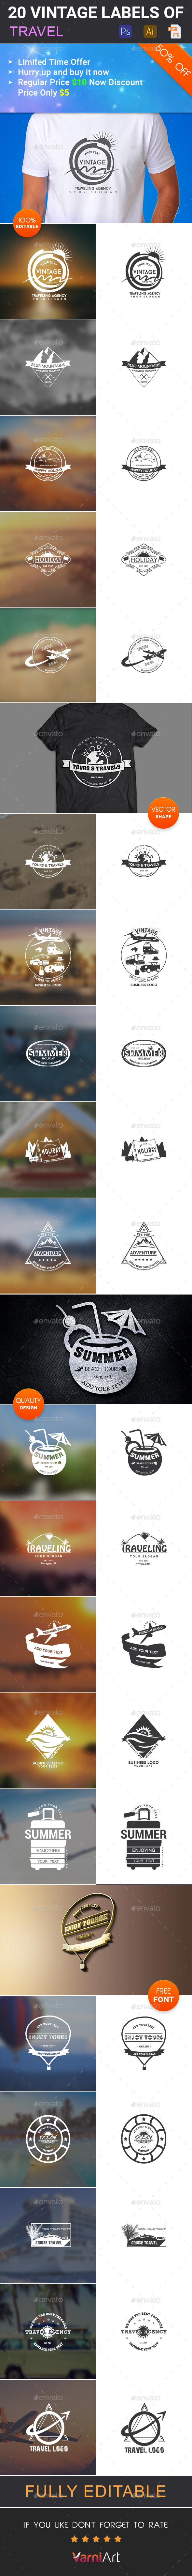 20 Travel Vintage Labels - Badges & Stickers Web Elements